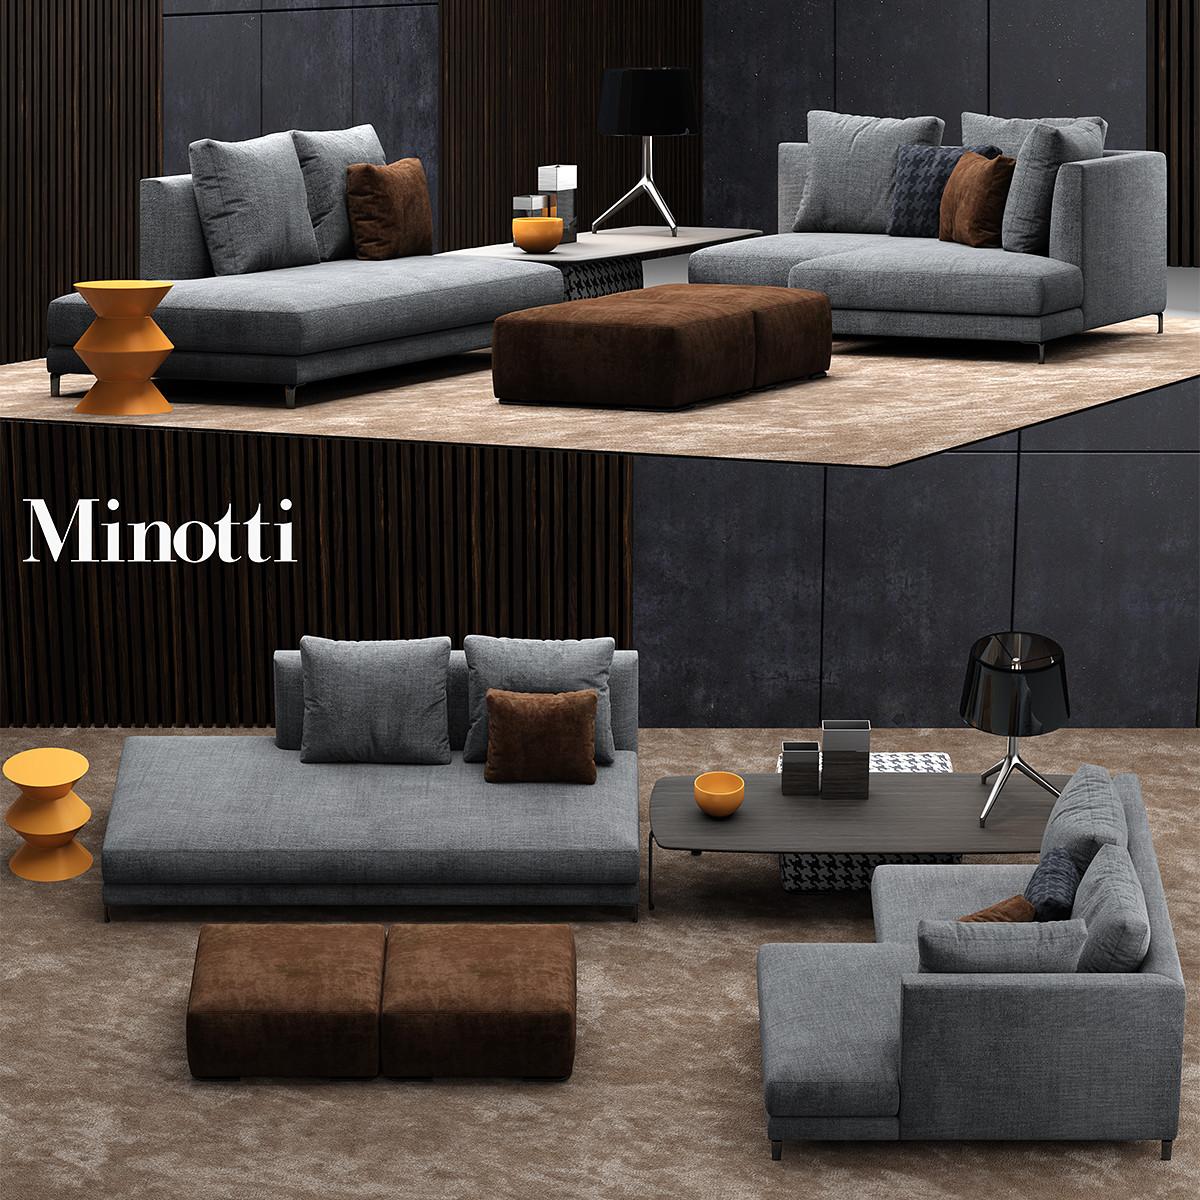 minotti allen sofa 3d model. Black Bedroom Furniture Sets. Home Design Ideas